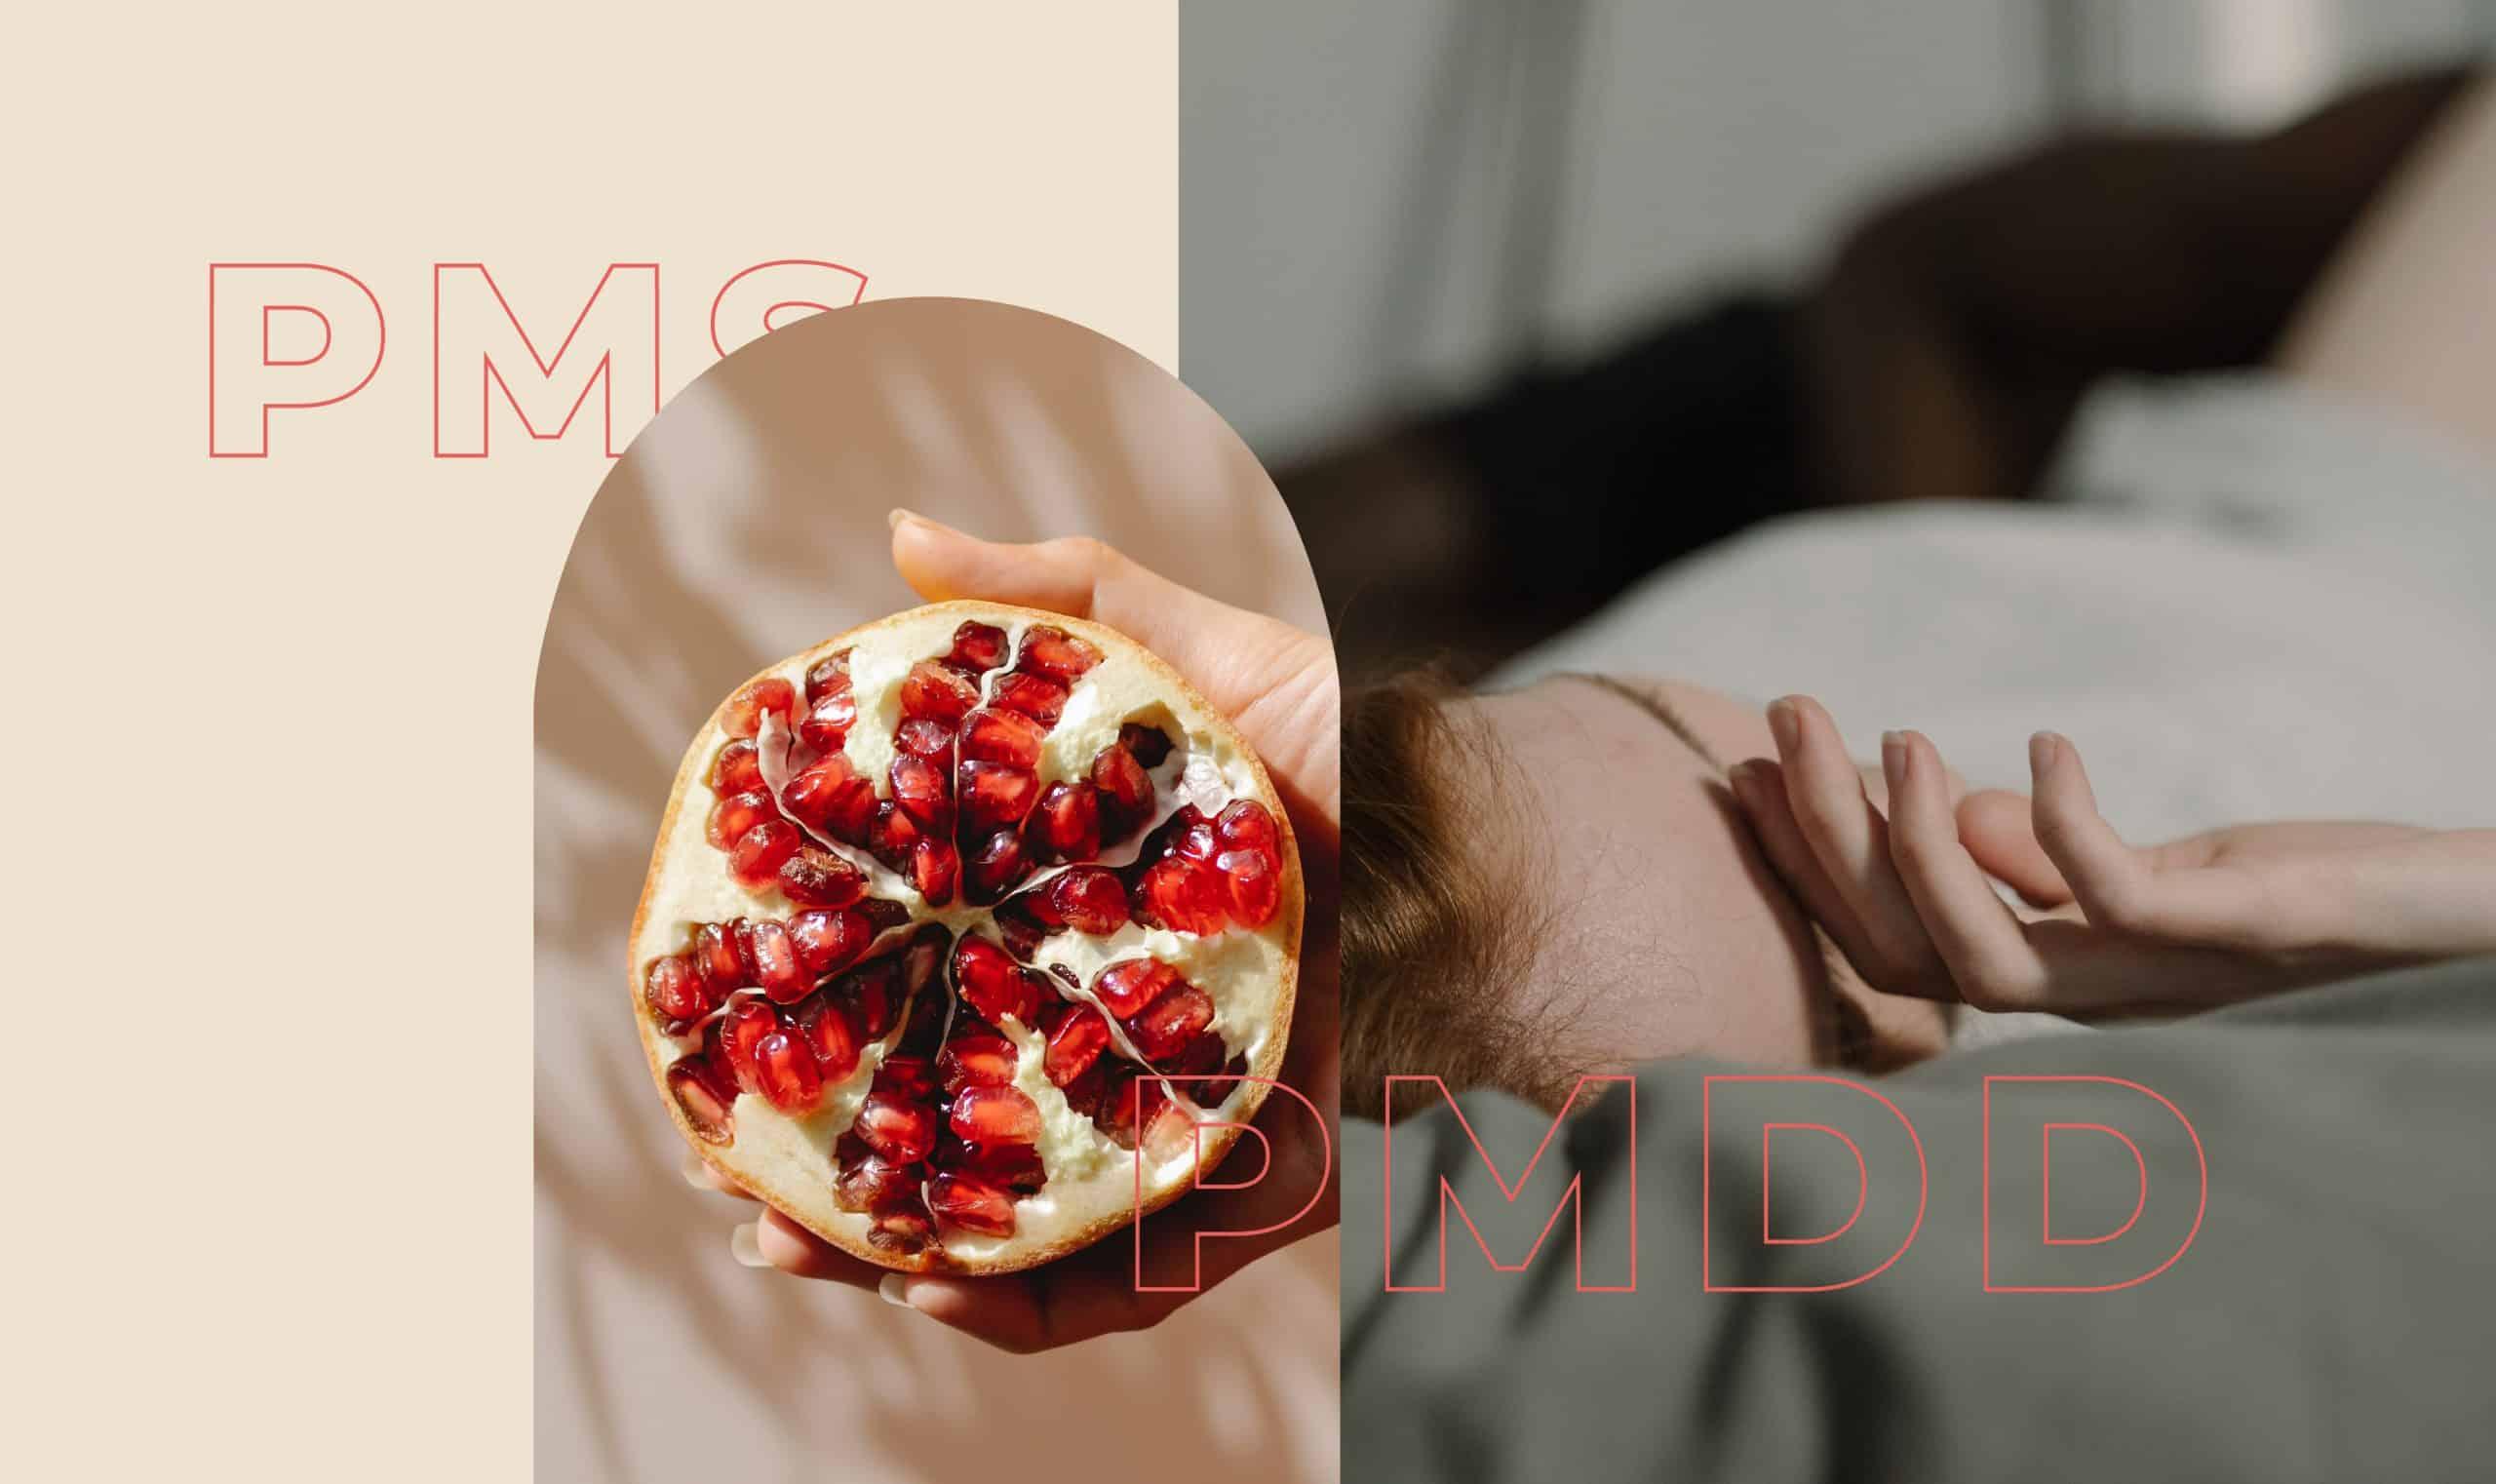 A piece of pomegranate fruit